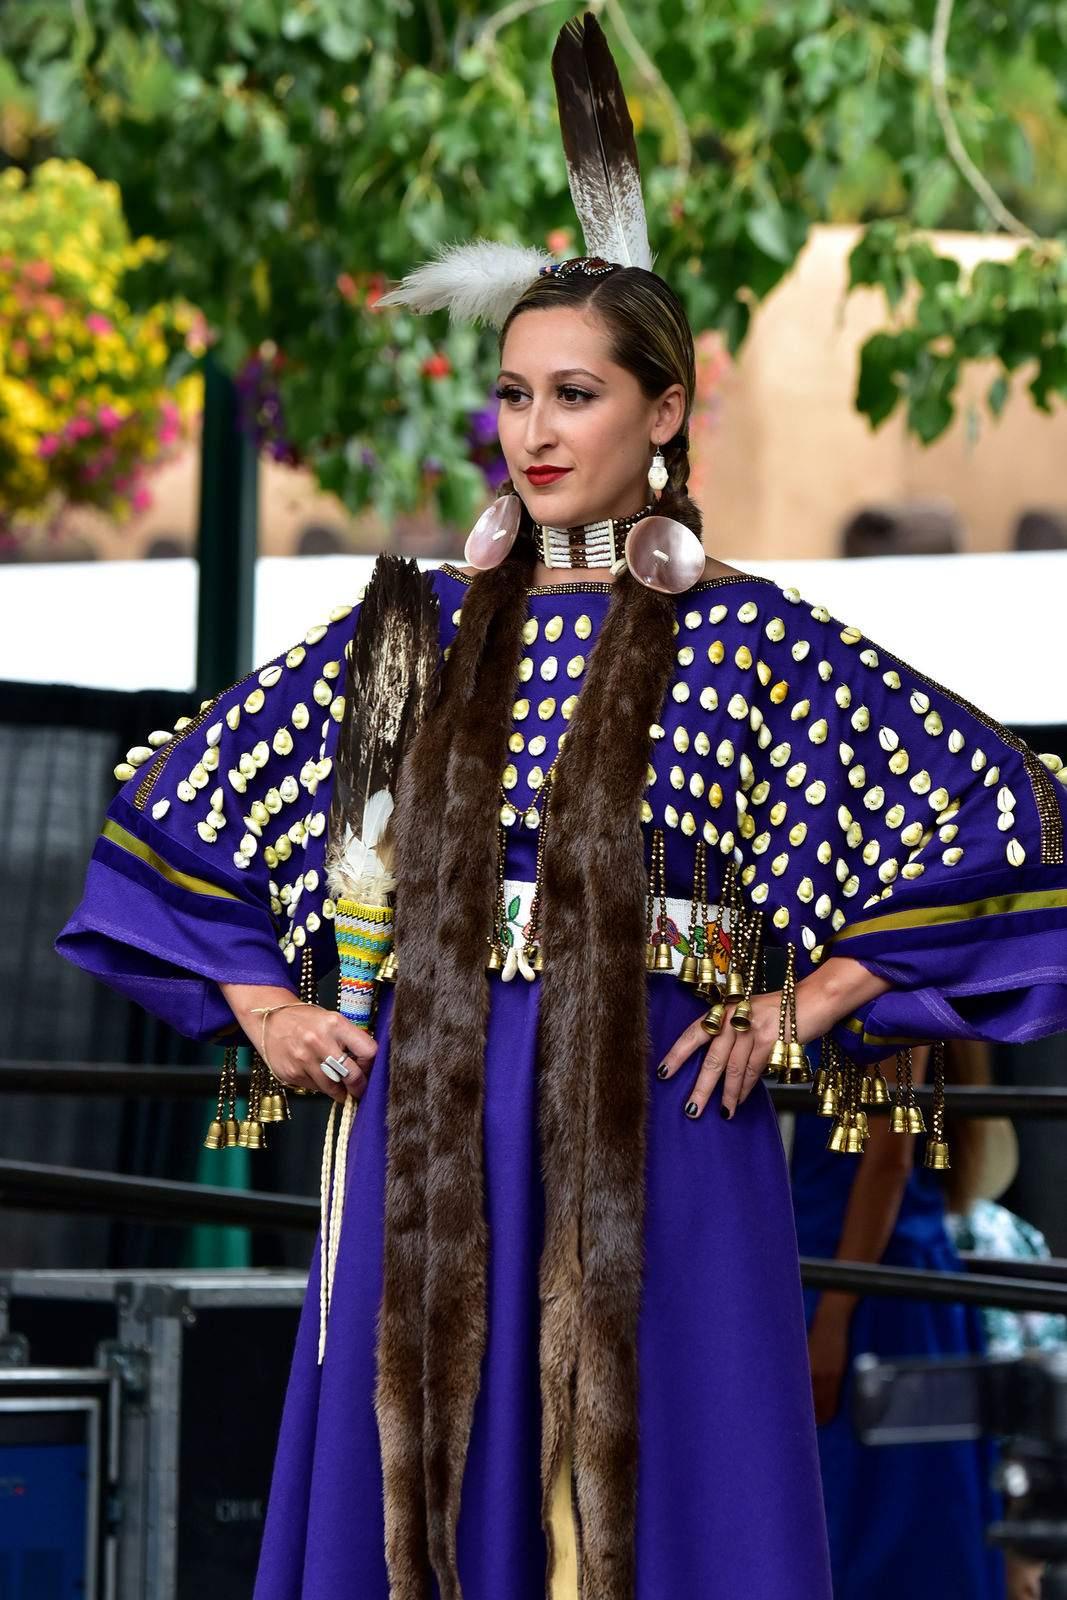 native american clothing10 Native American Clothing Contest at Santa Fe Indian Market